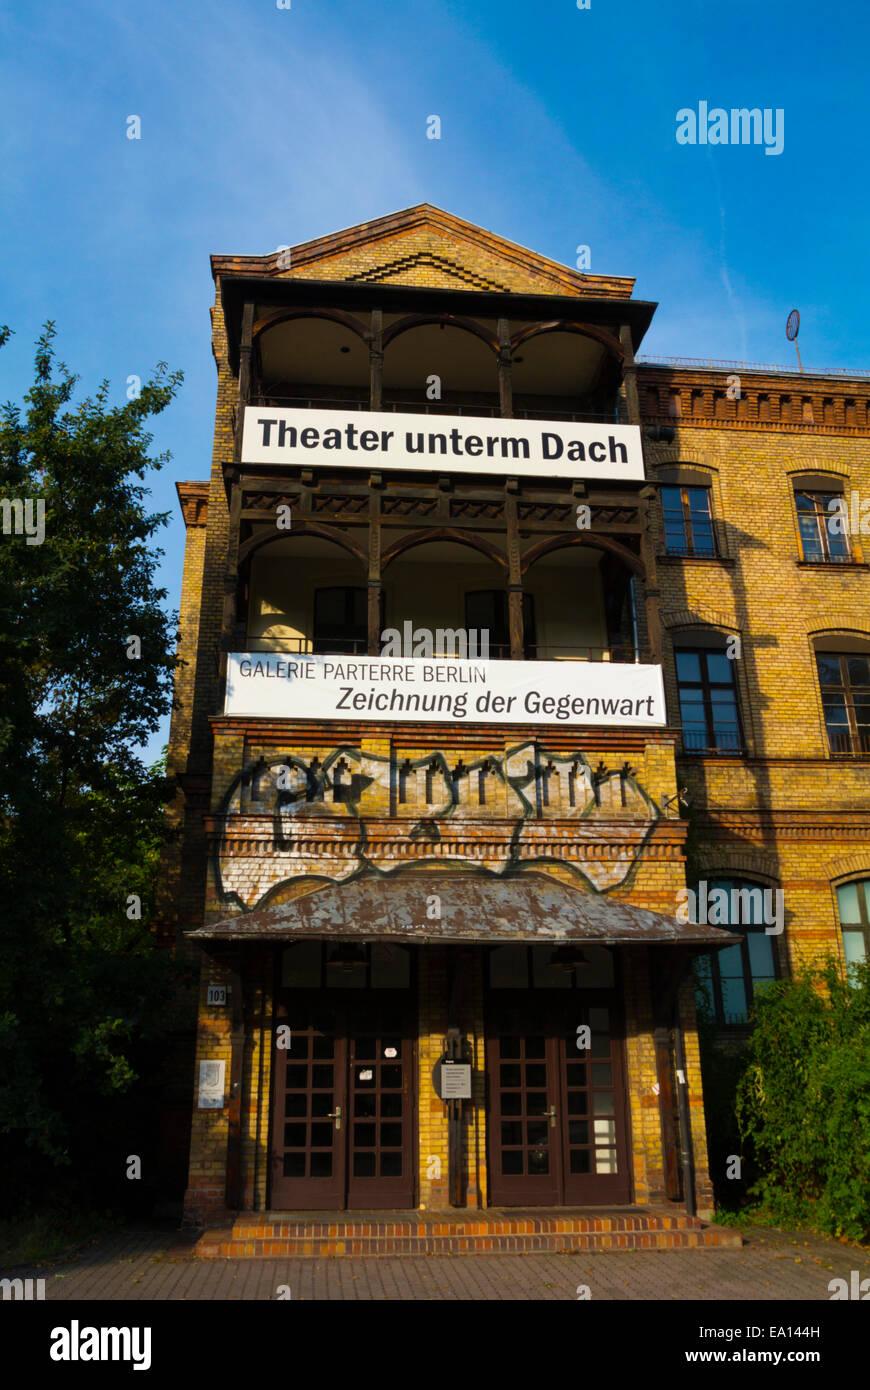 Theater unterm Dach theatre, Kulturhaus, former gasworks, Ernst-Thälmann-Park, Prenzlauer Berg district, Berlin, - Stock Image